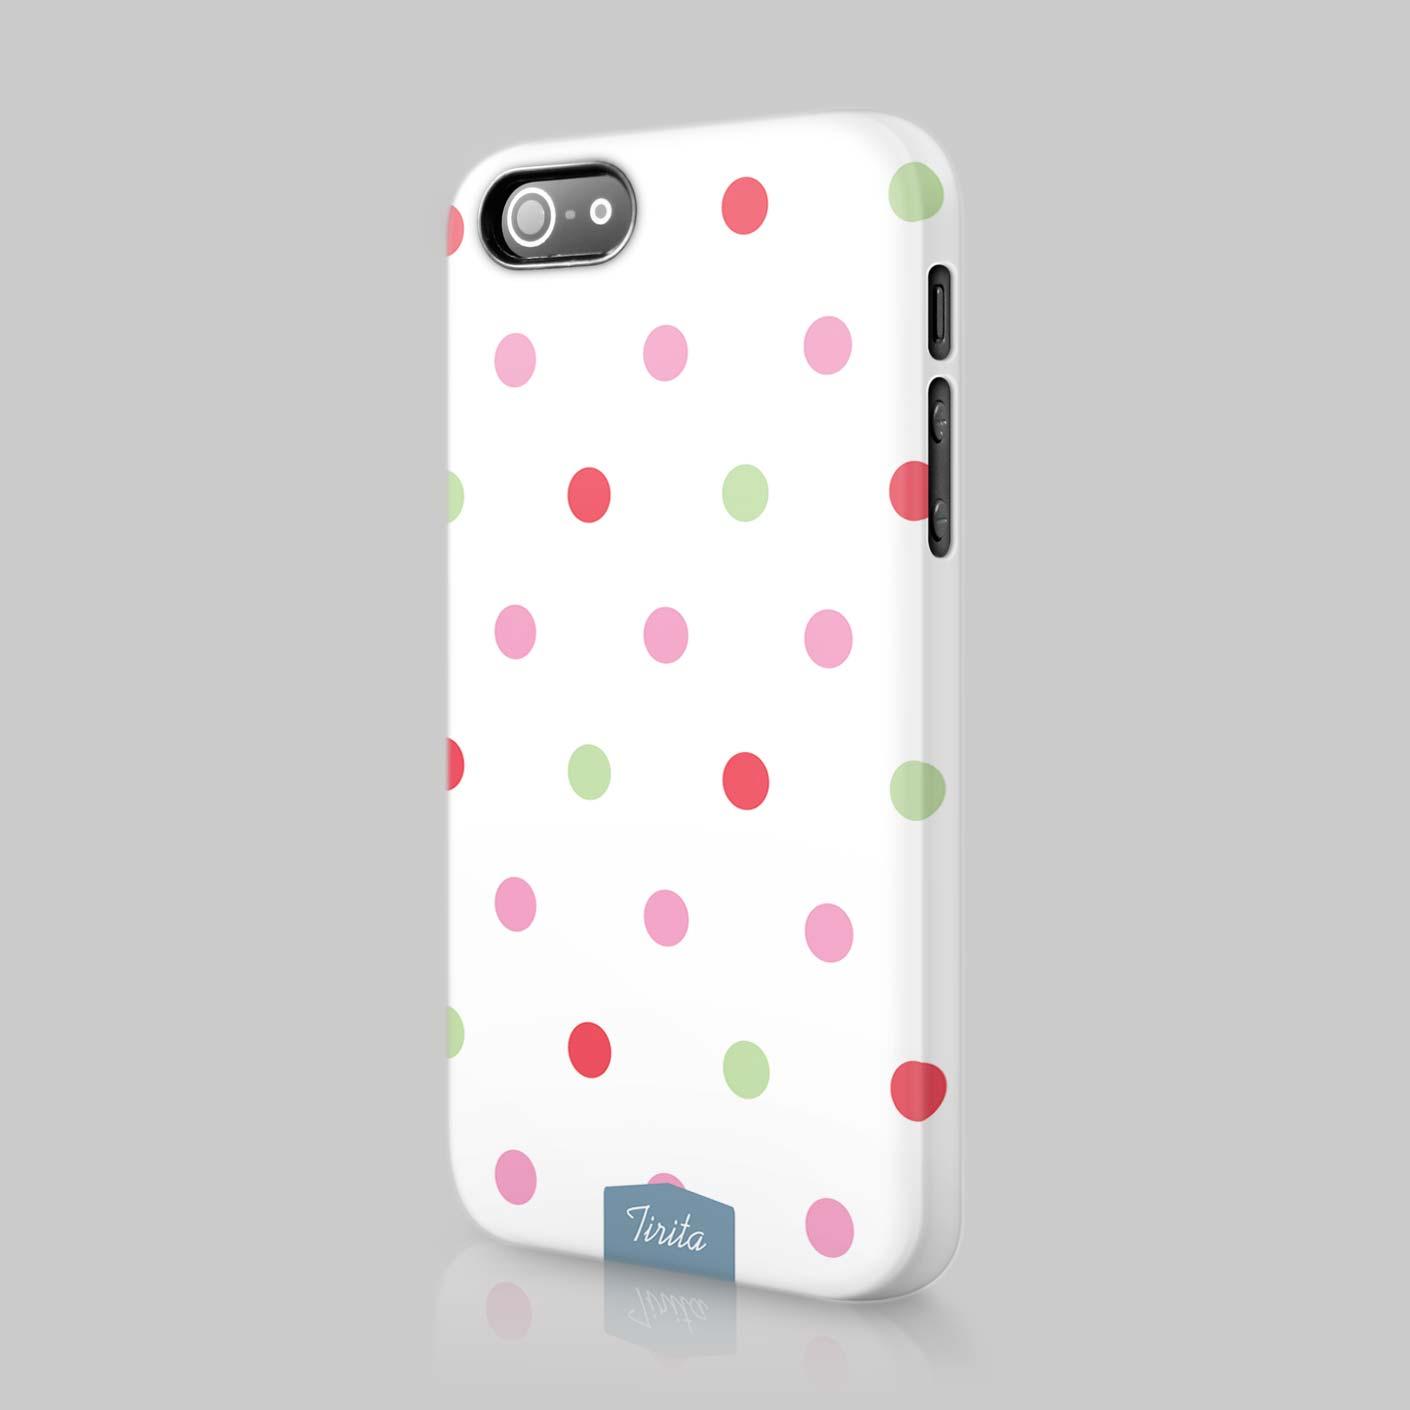 Tirita Polka Dots Fashion Case Hard Cover For iPhone 4 5 6 ...